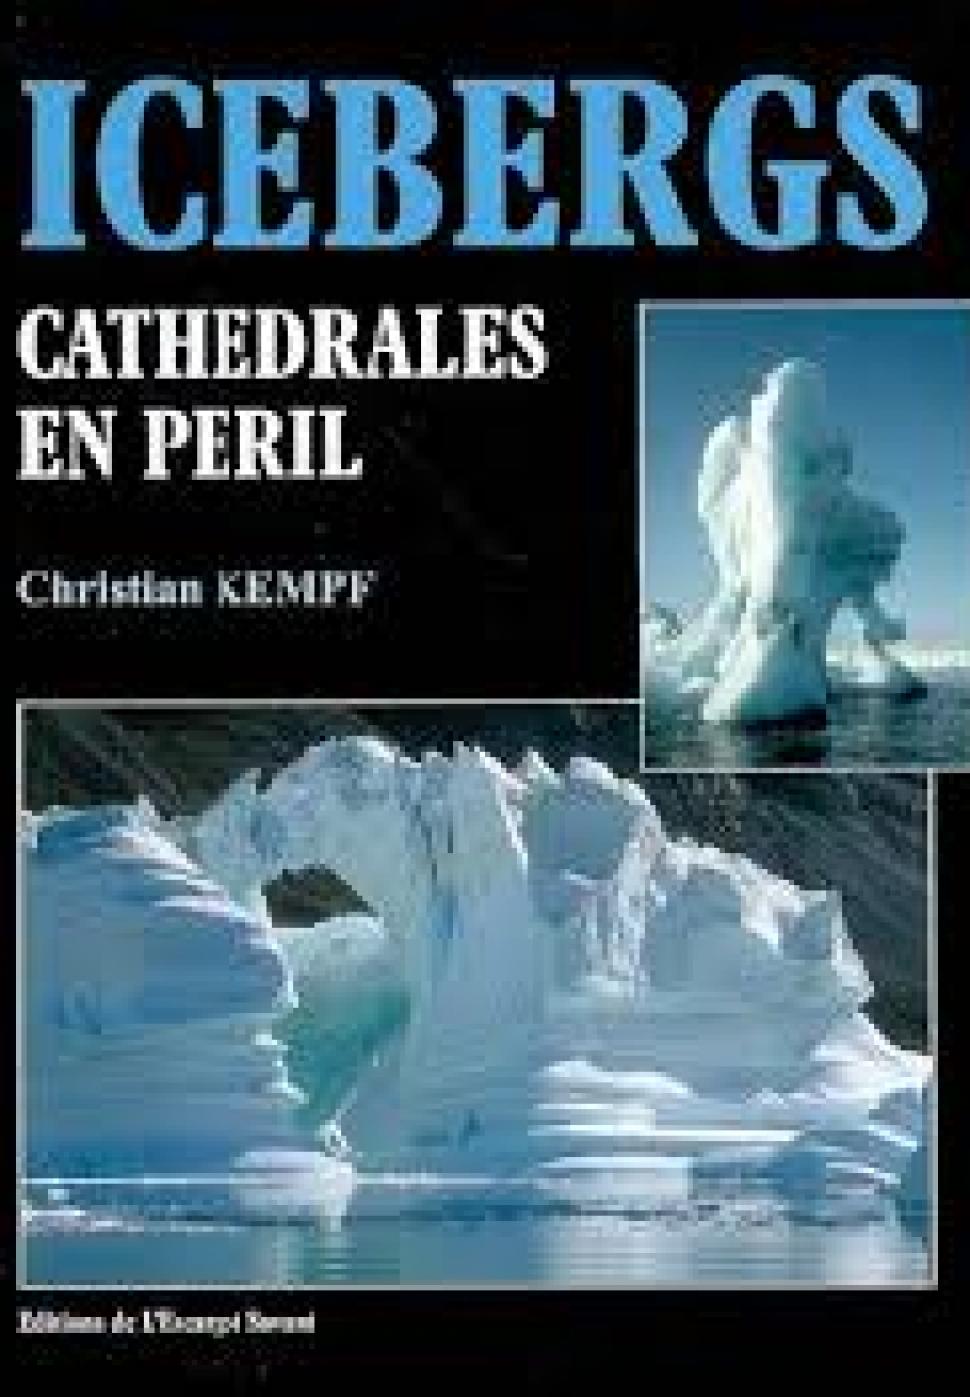 Icebergs, cathédrales en péril